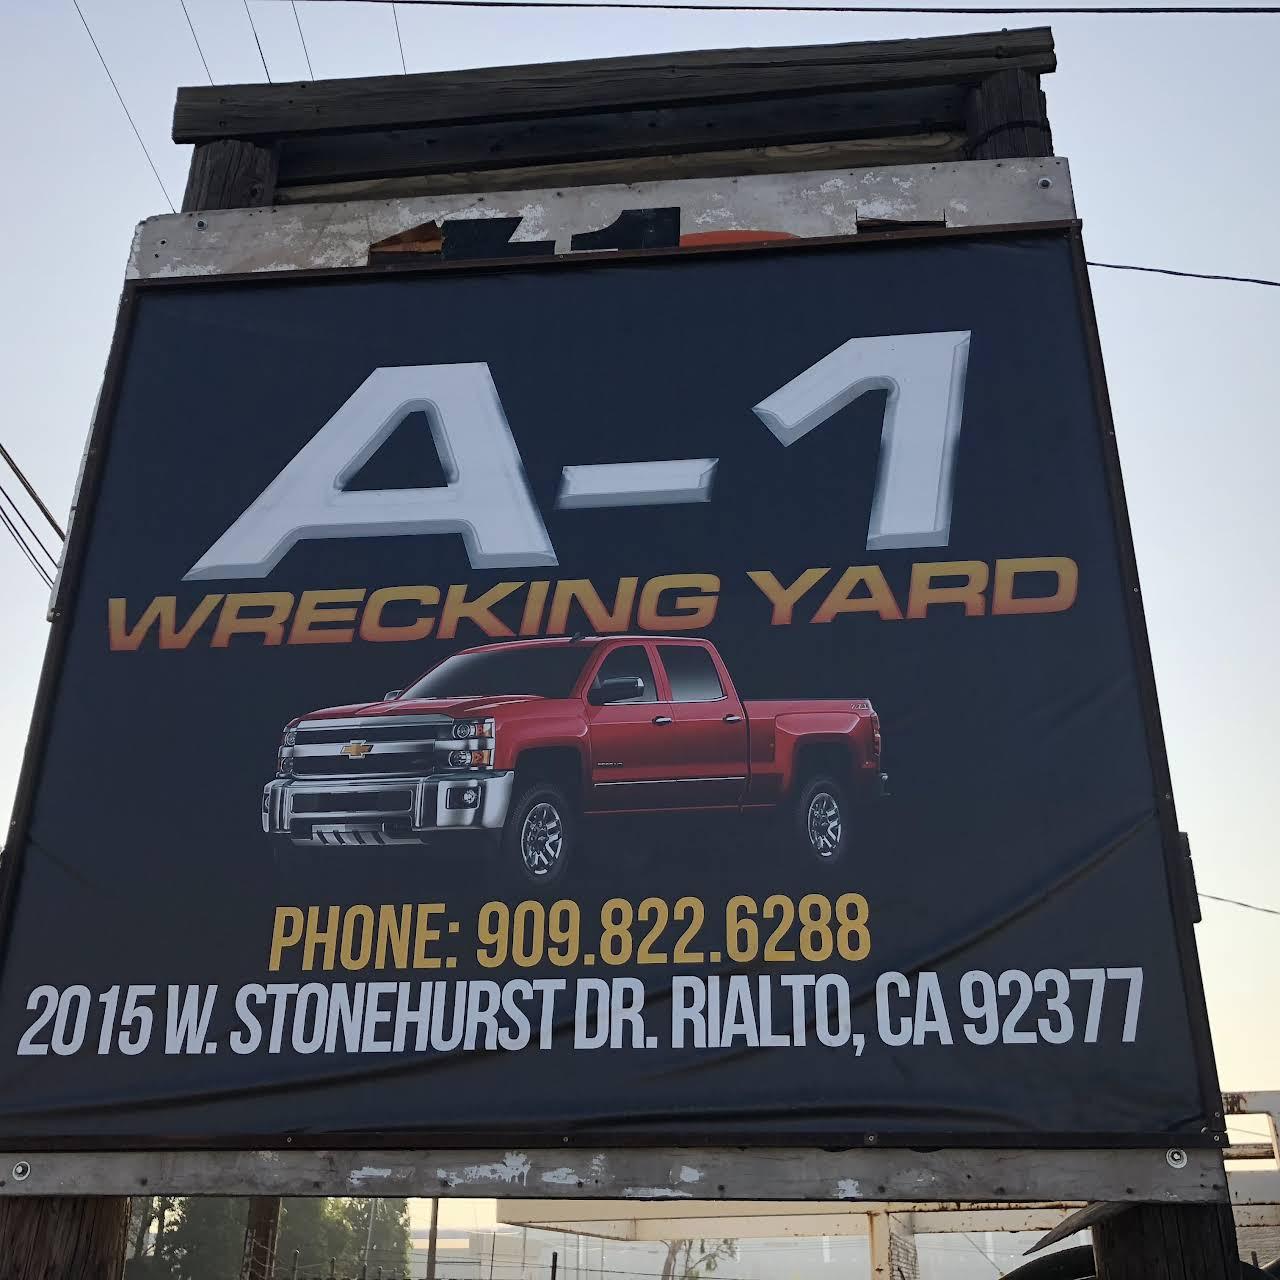 A-1 Wrecking Yard - Junkyard in Rialto